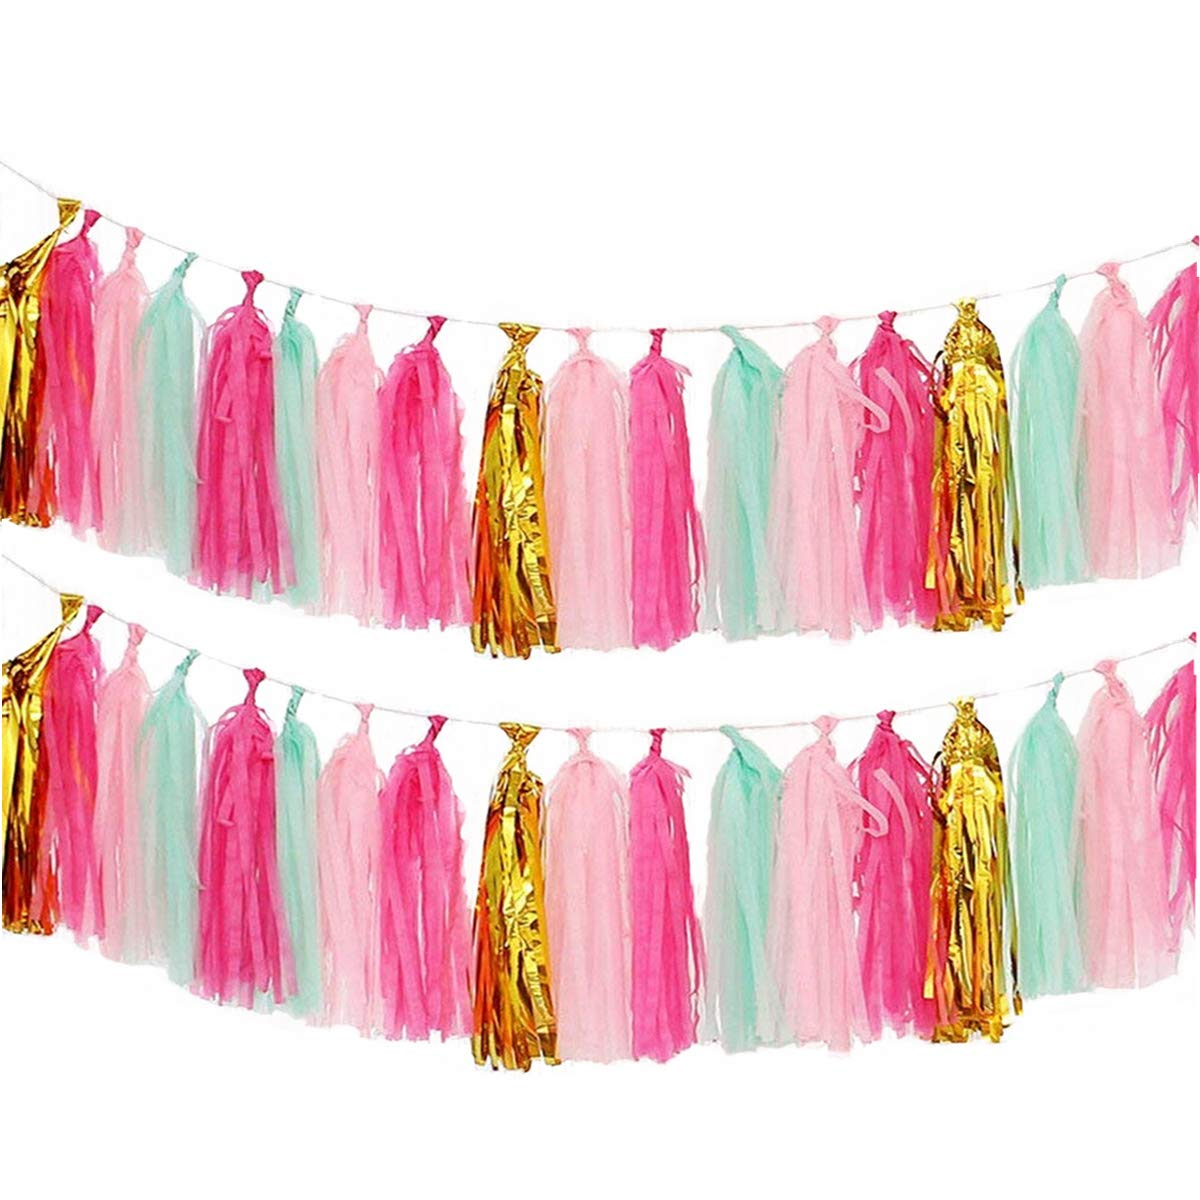 Derhom Tissue Paper Tassel Garland - 20pcs Tassels per Package - 12 inch Long Tassels (Gold/Pink) Derhom-002